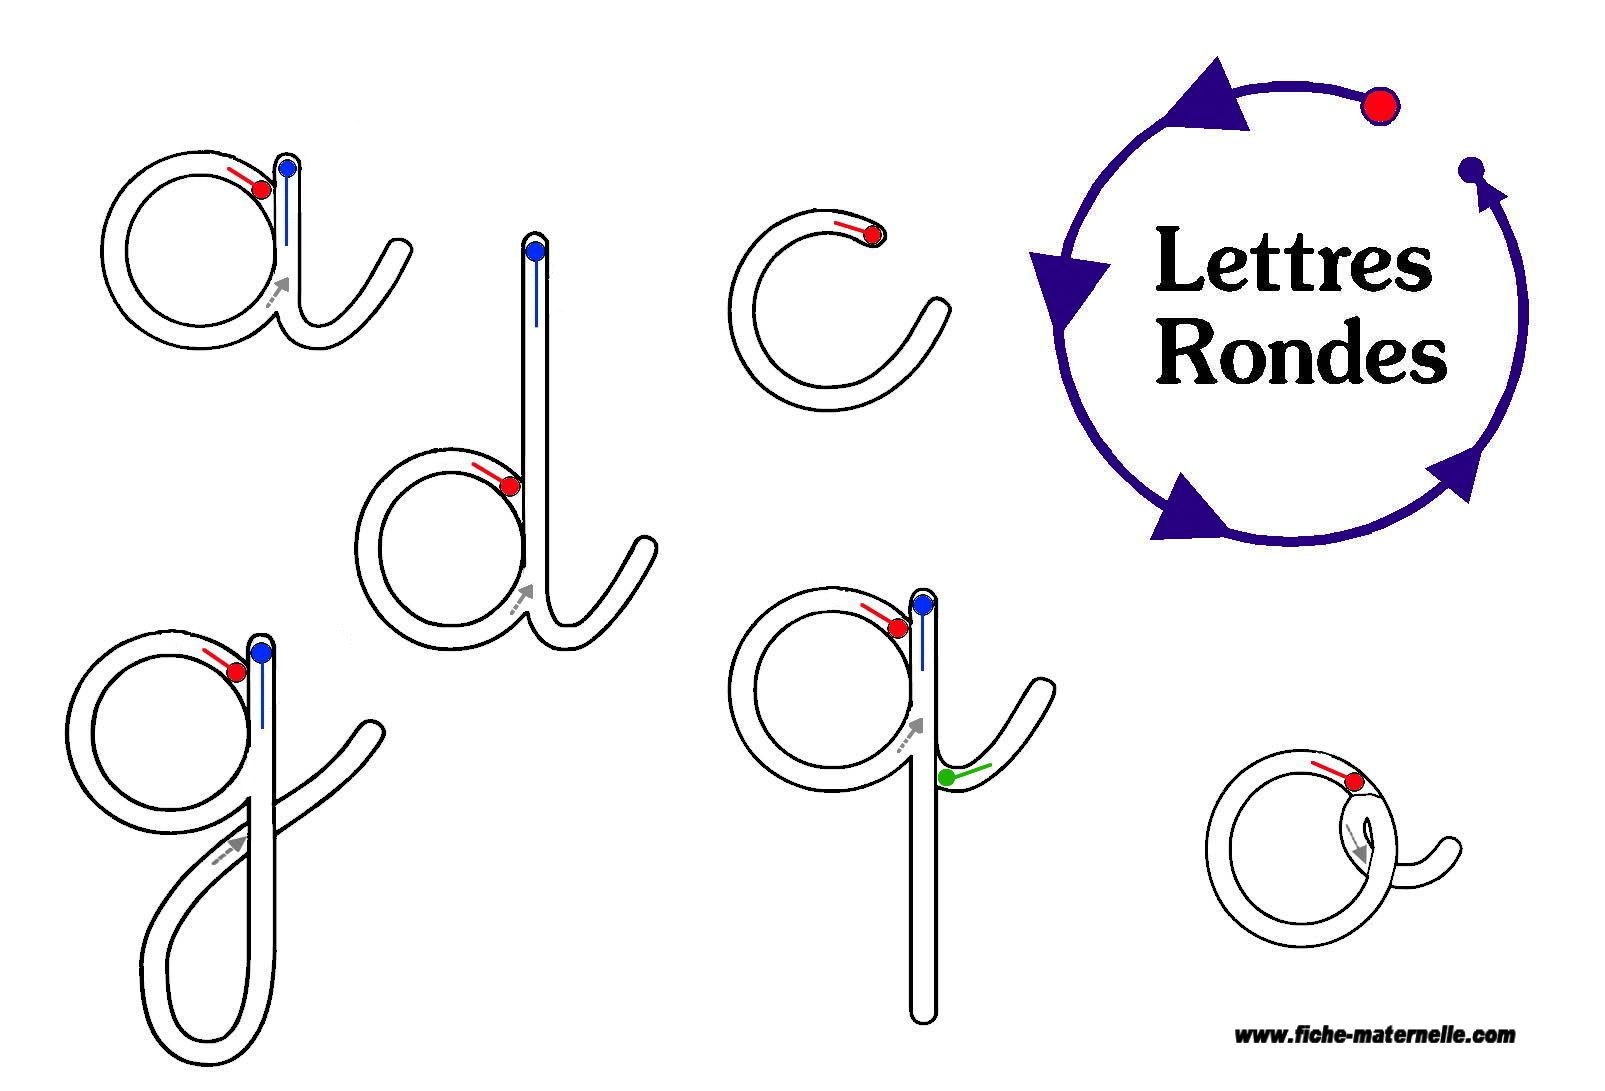 graphisme   sens de trac u00e9 des lettres rondes